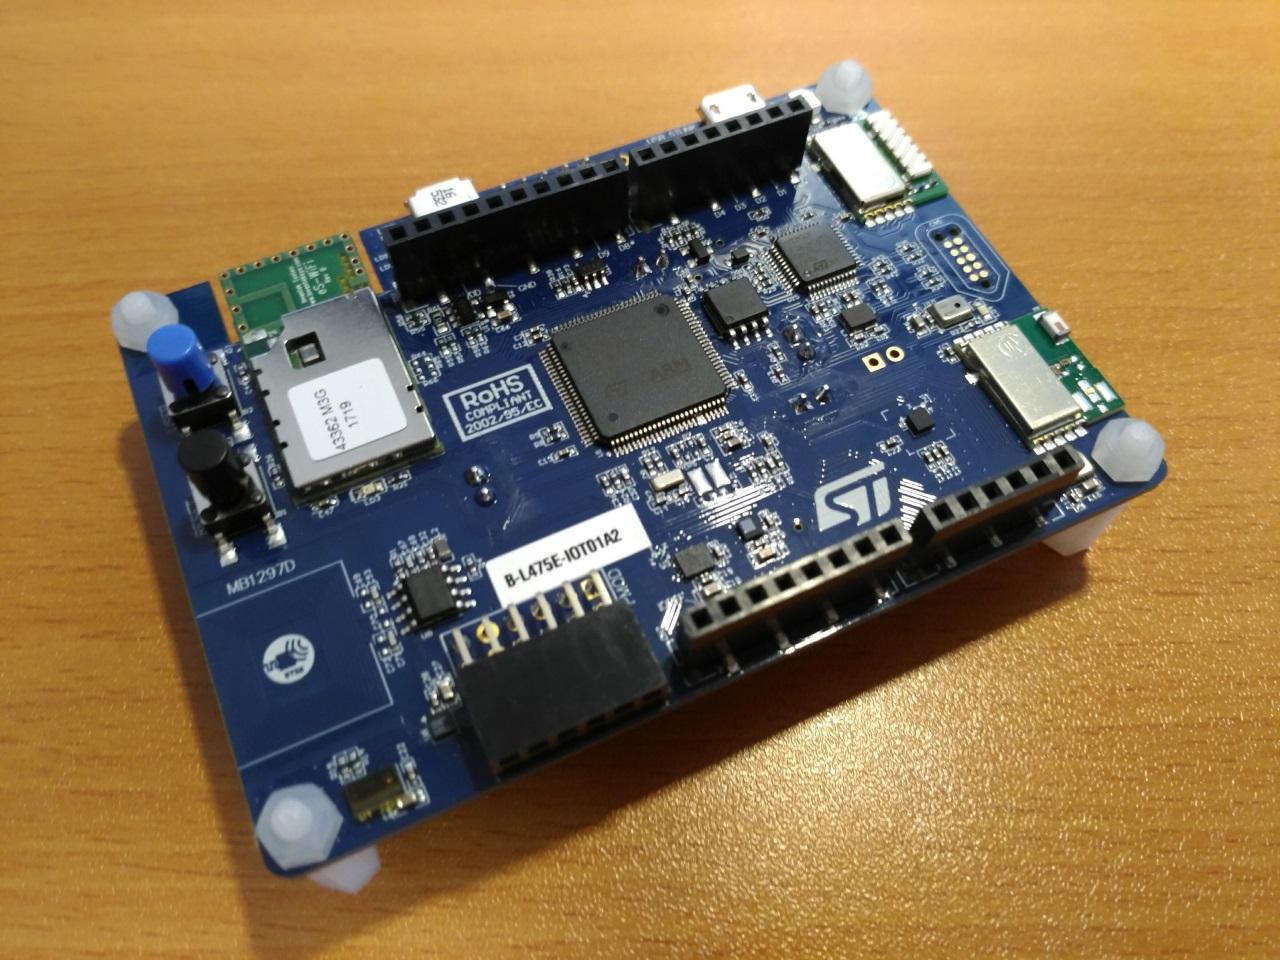 STM32 by ST B-L475E-IOT01A1 STM32L4 Discovery kit IoT node low-power...